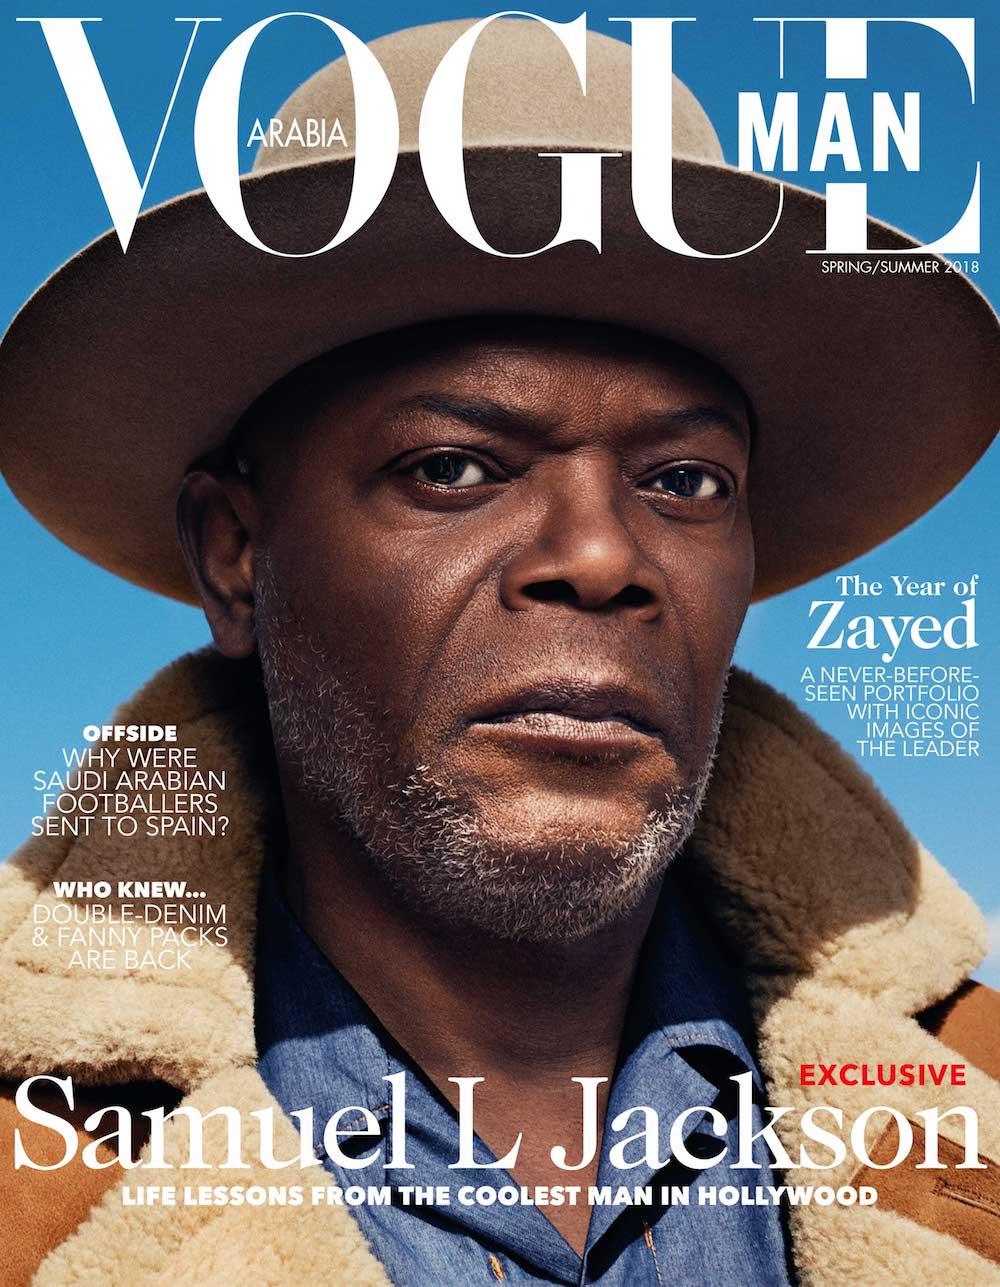 Magazine Covers On Twitter Samuel L Jackson For Vogue Man Arabia Spring Summer 2018 Samuelljackson Vogue